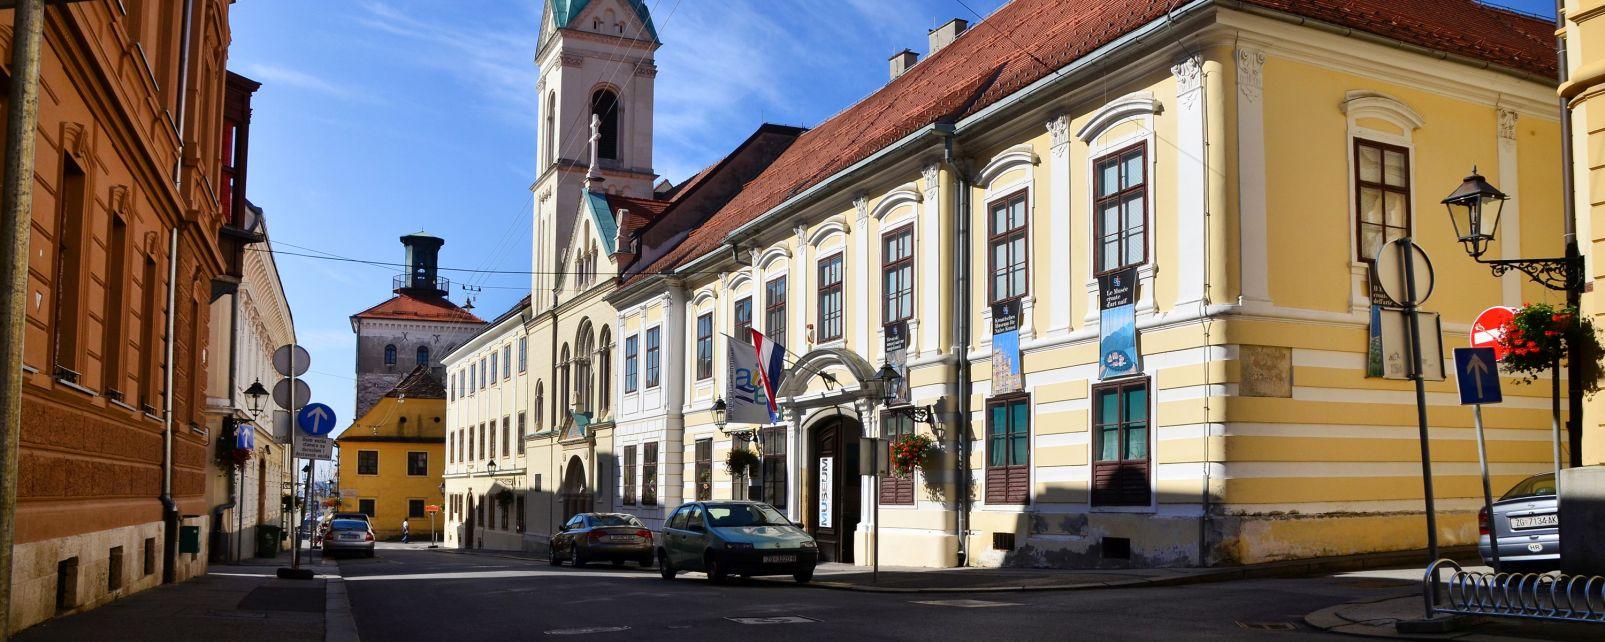 Les arts et la culture, croatie, art, musée, ratkay, zagreb, europe, peinture, art naïf